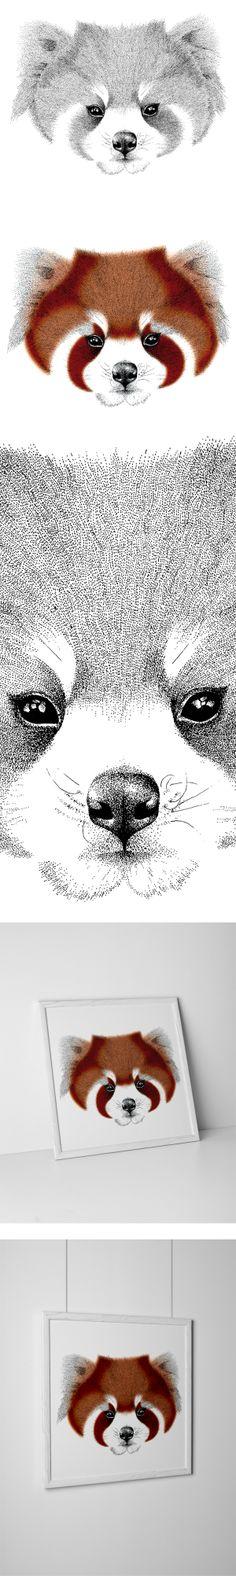 Red Panda by Kelsey Emblow, via Behance